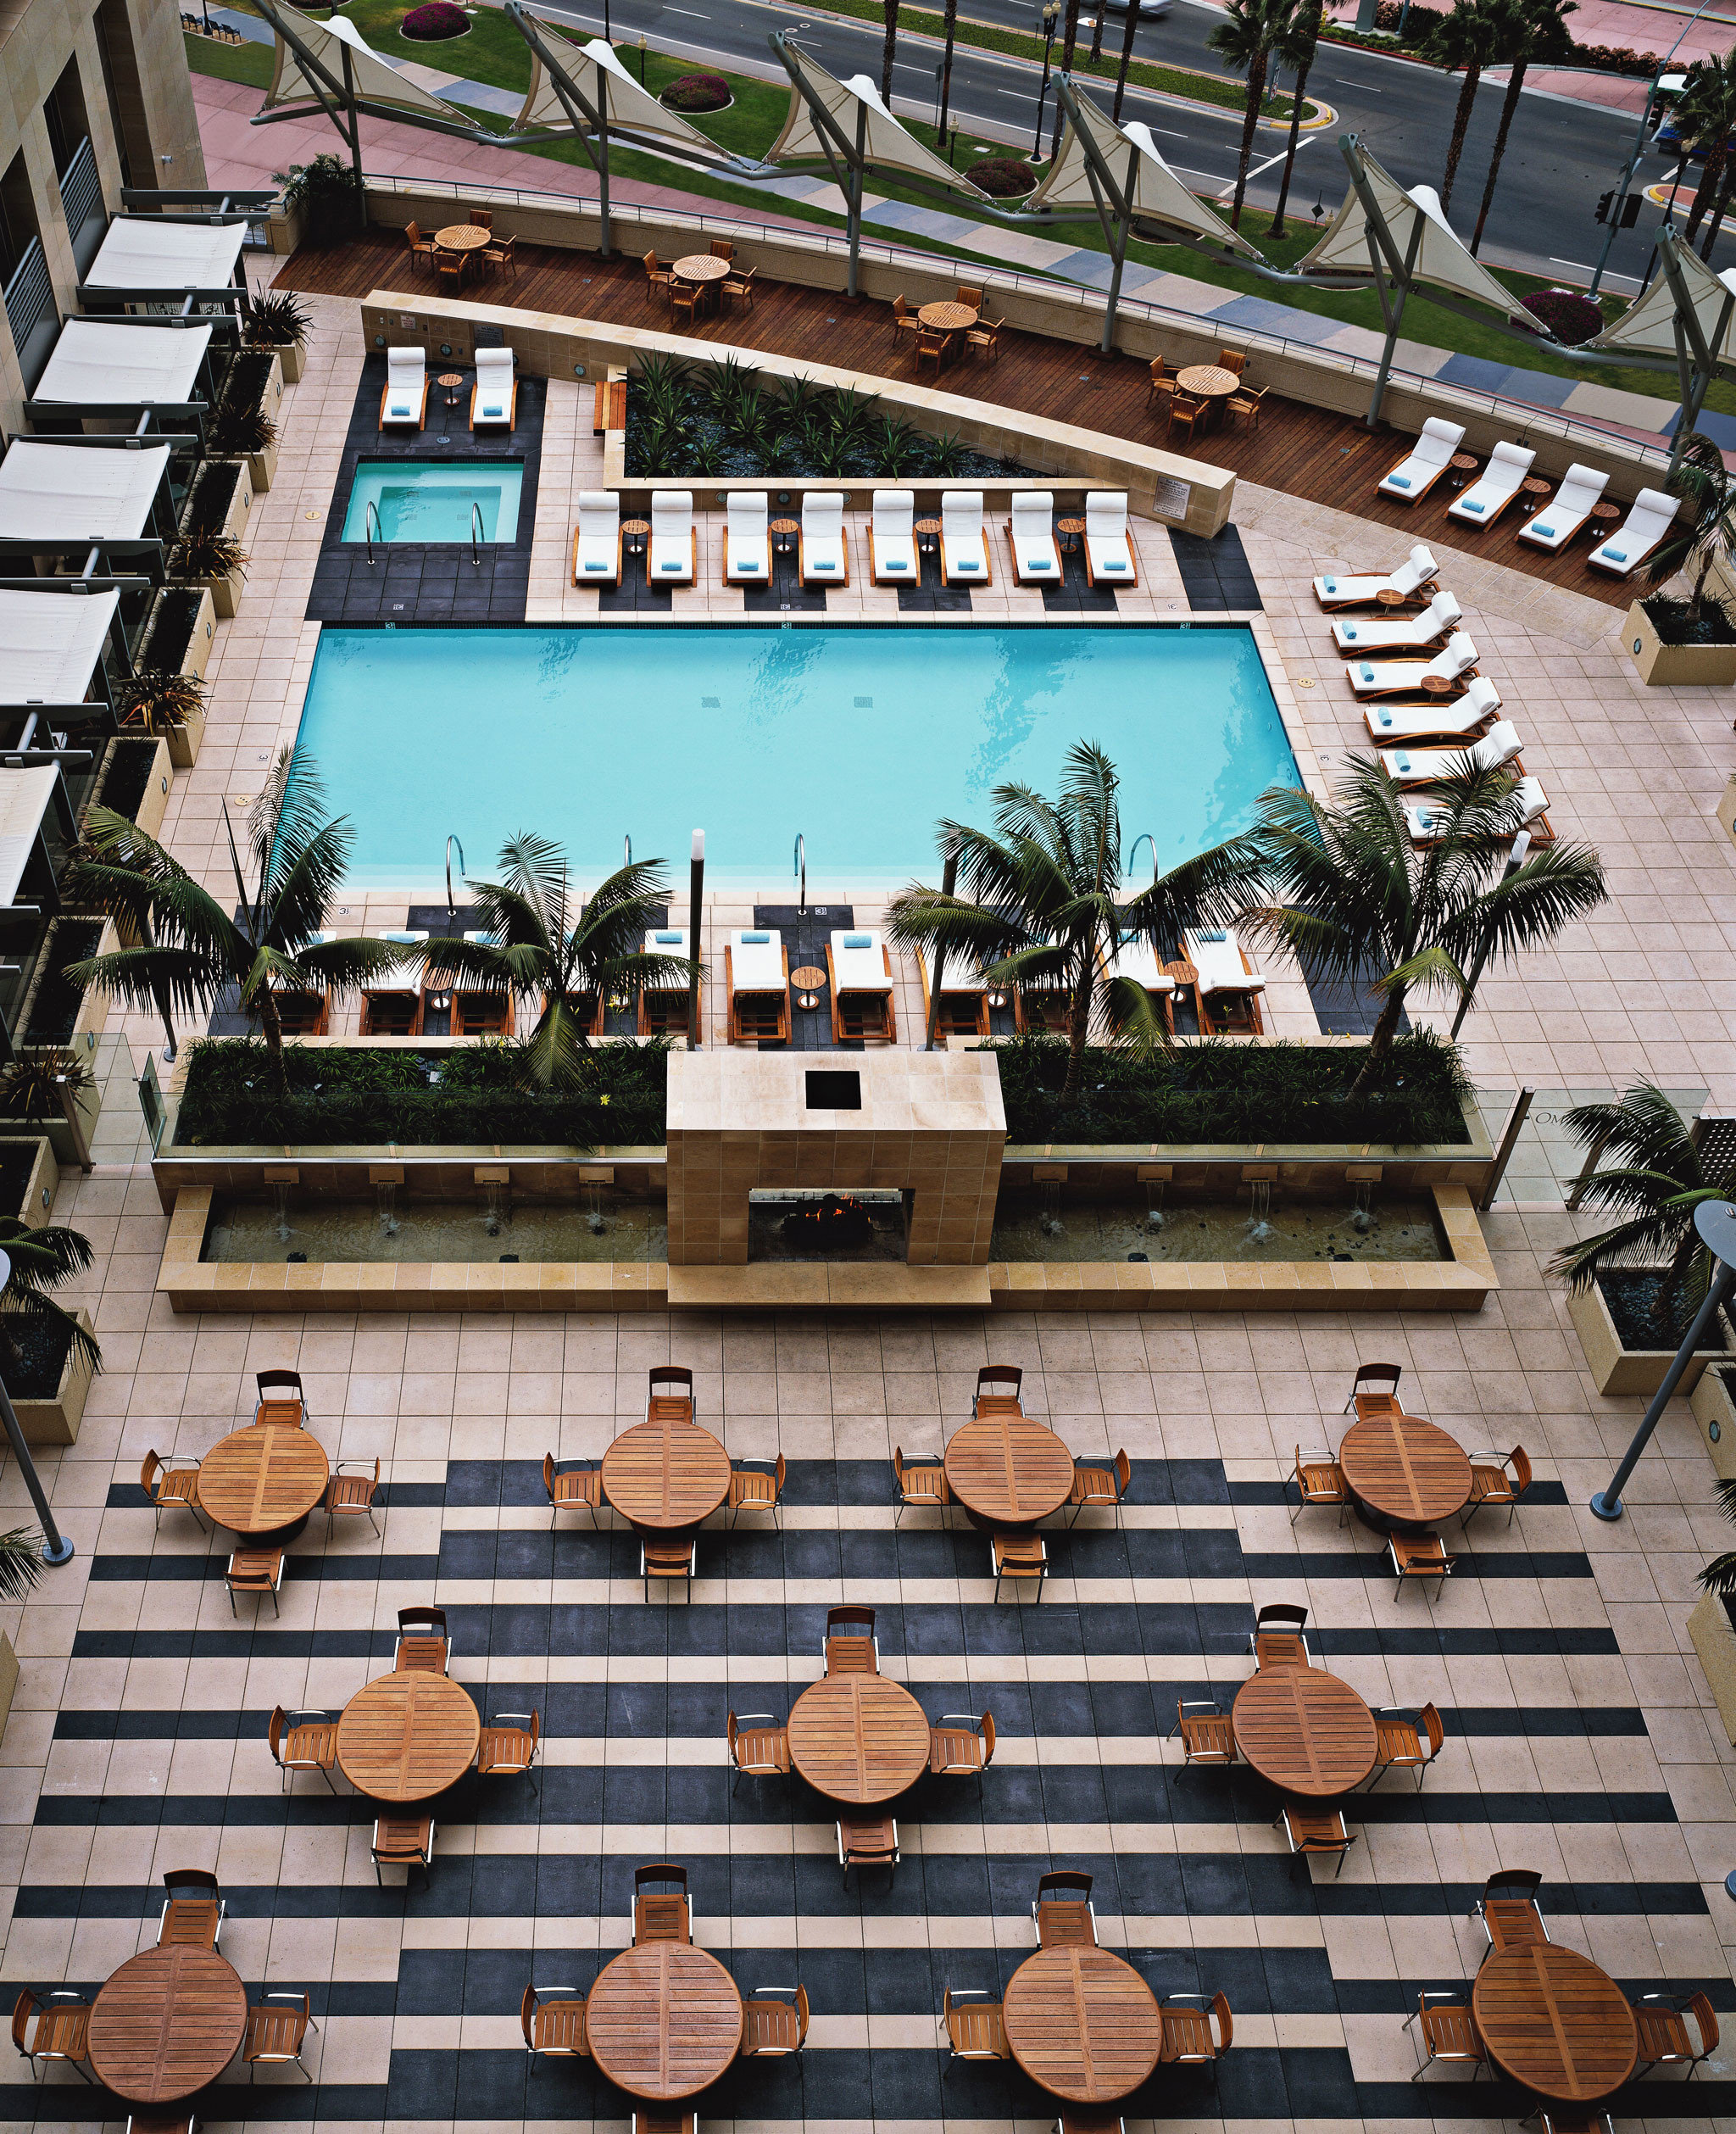 Hotels Lounge Luxury Modern Scenic views Trip Ideas roof